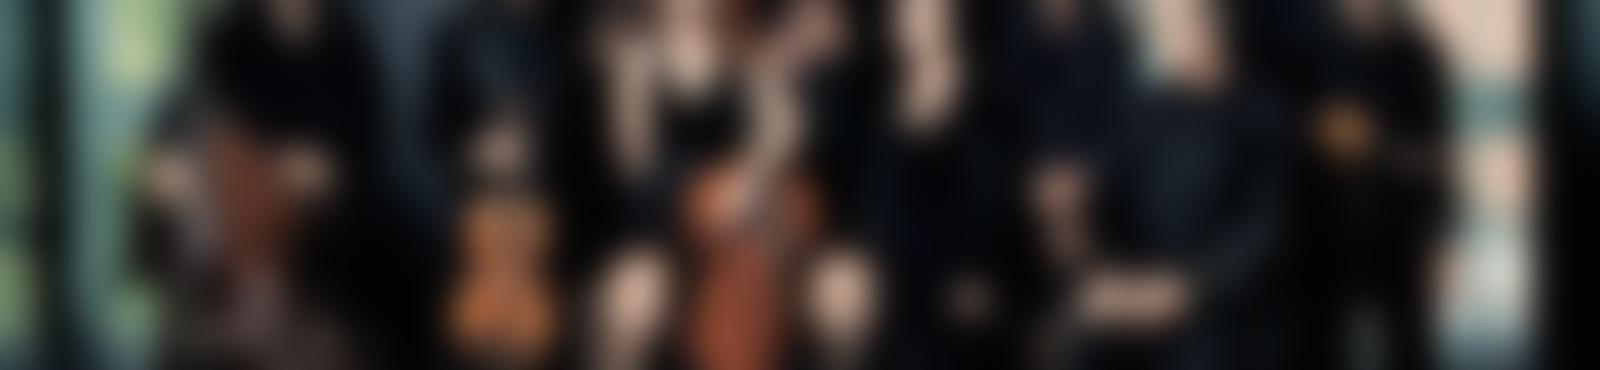 Blurred dbbeef03 d3e3 4a06 82d9 ba913e1a771a